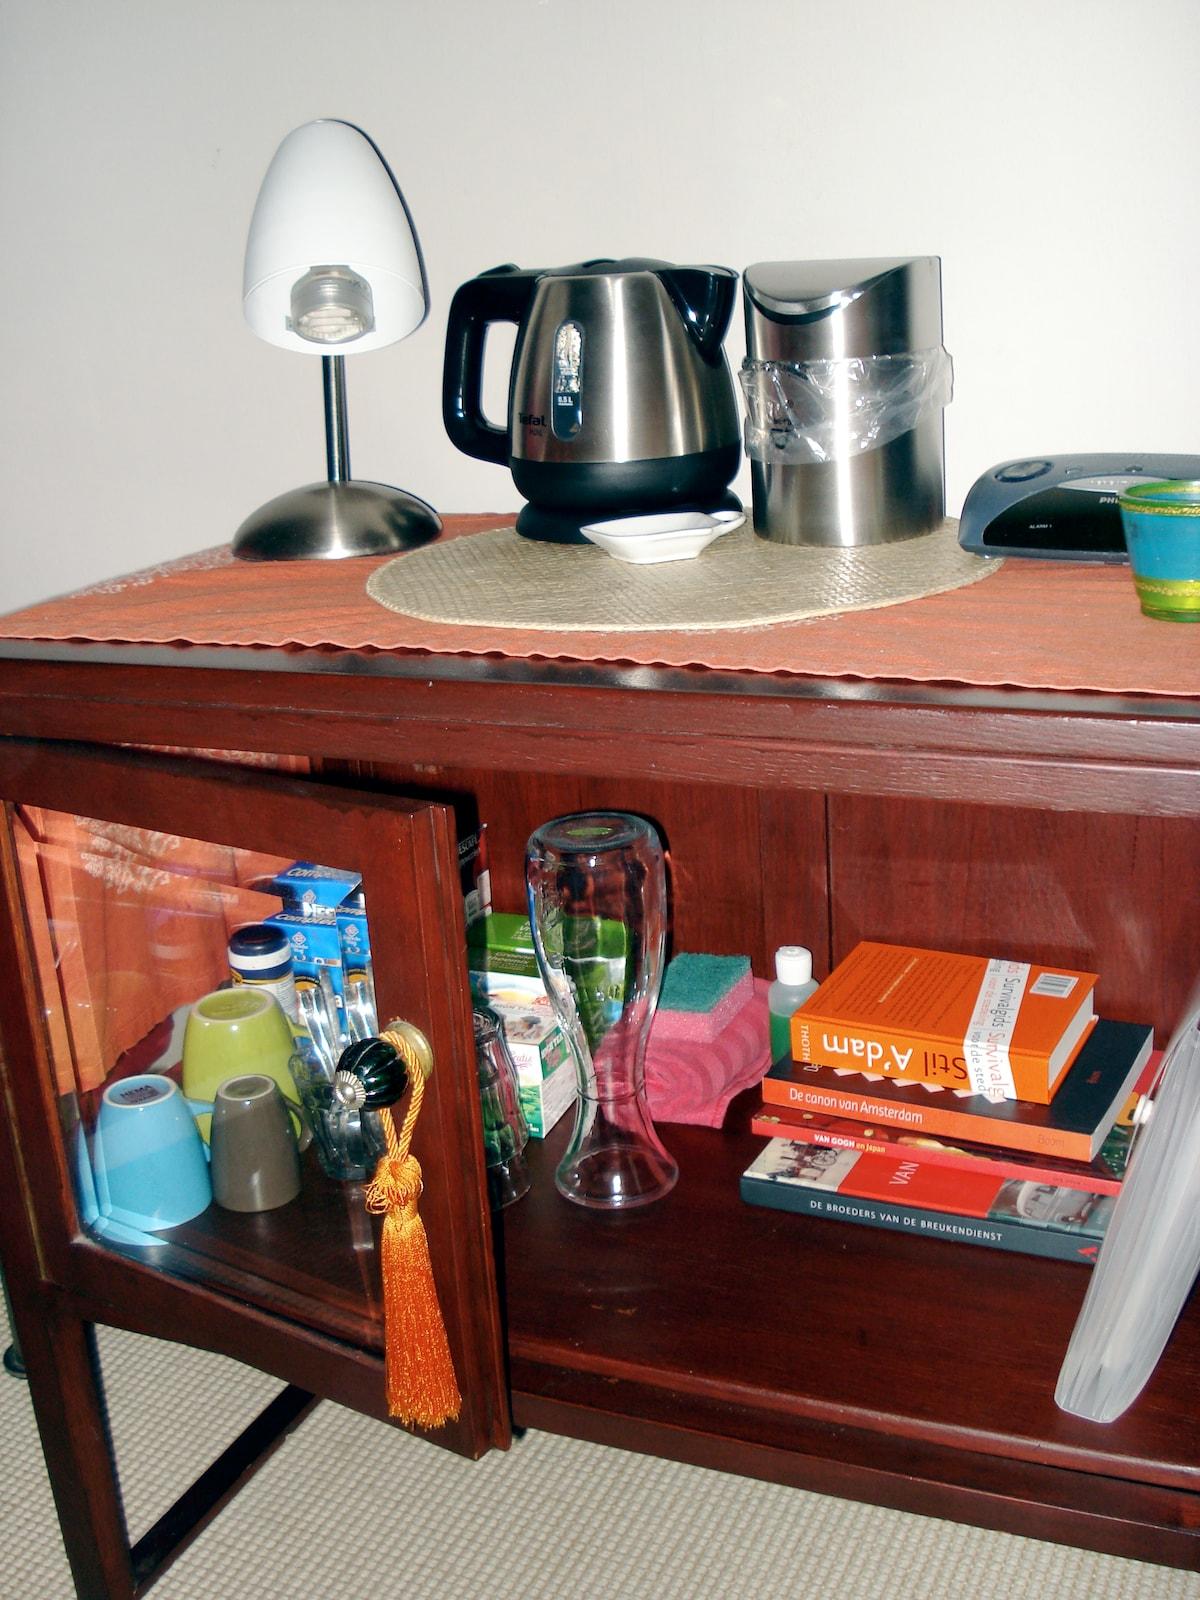 Watercooker: make your own tea or coffee (free).